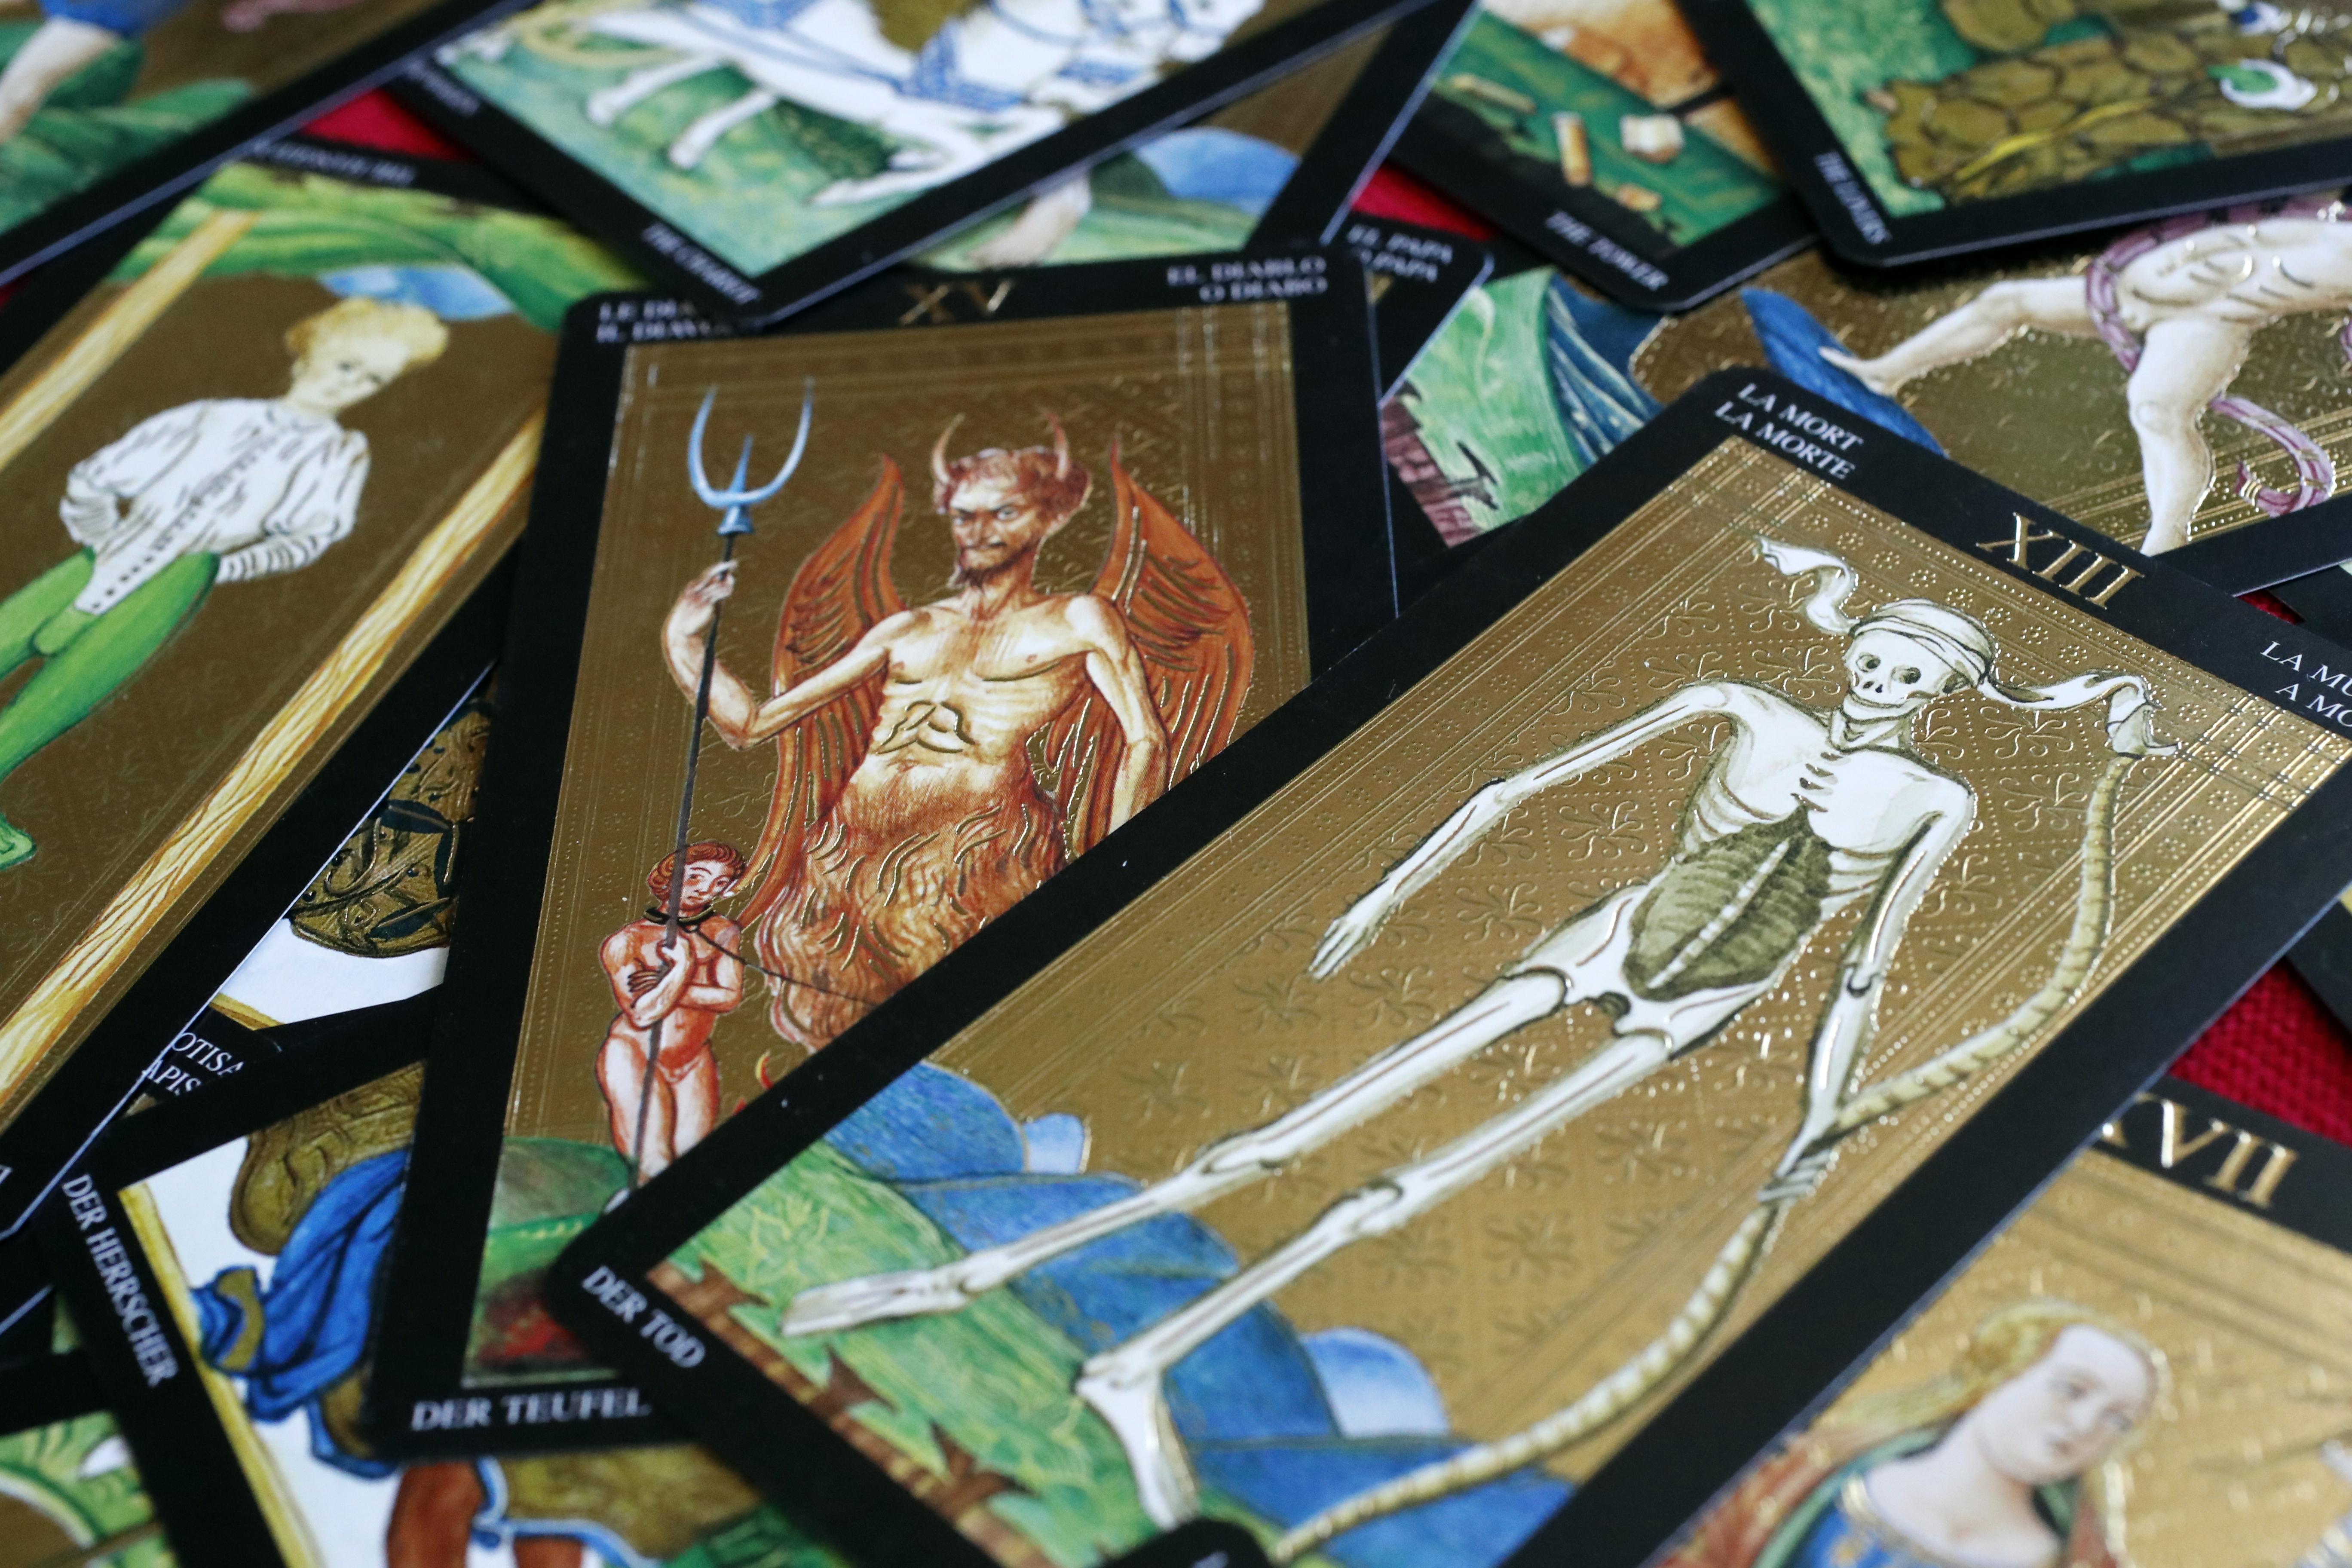 Tarot cards. The devil. Death.